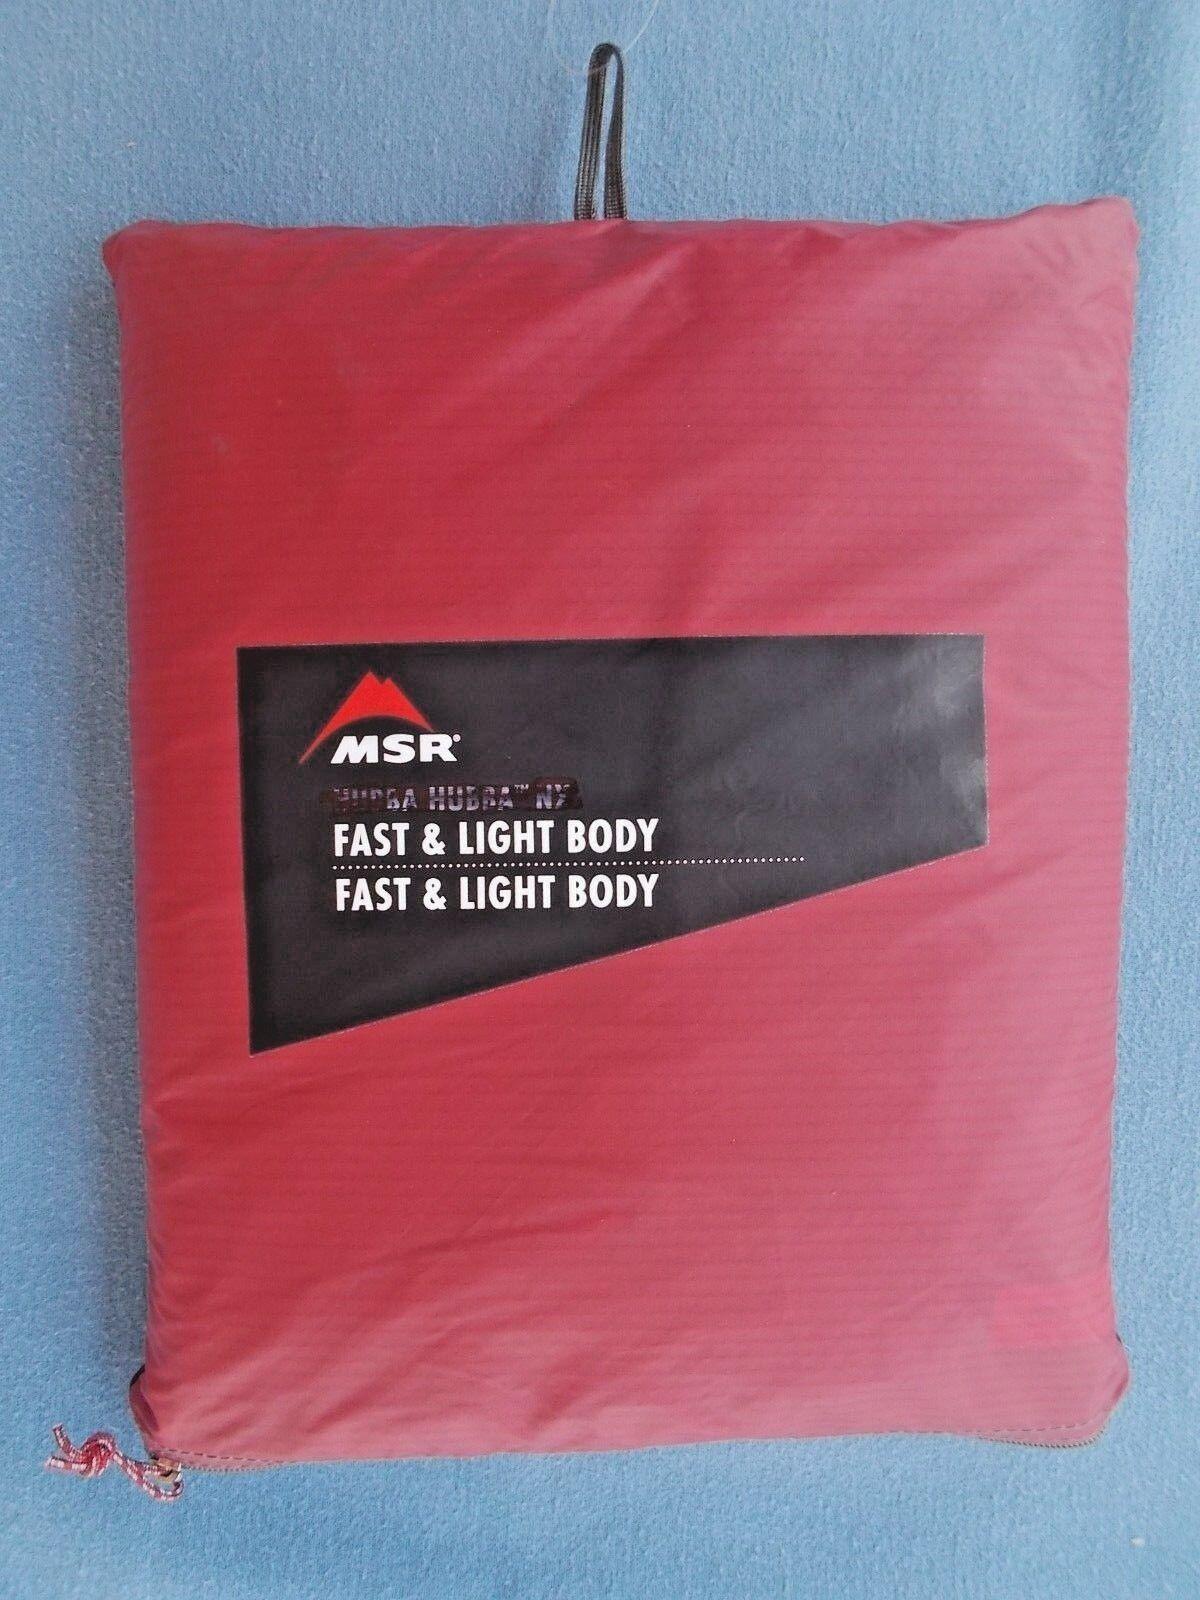 MSR Hubba Tour 2 Fast & Light Series Tent Body